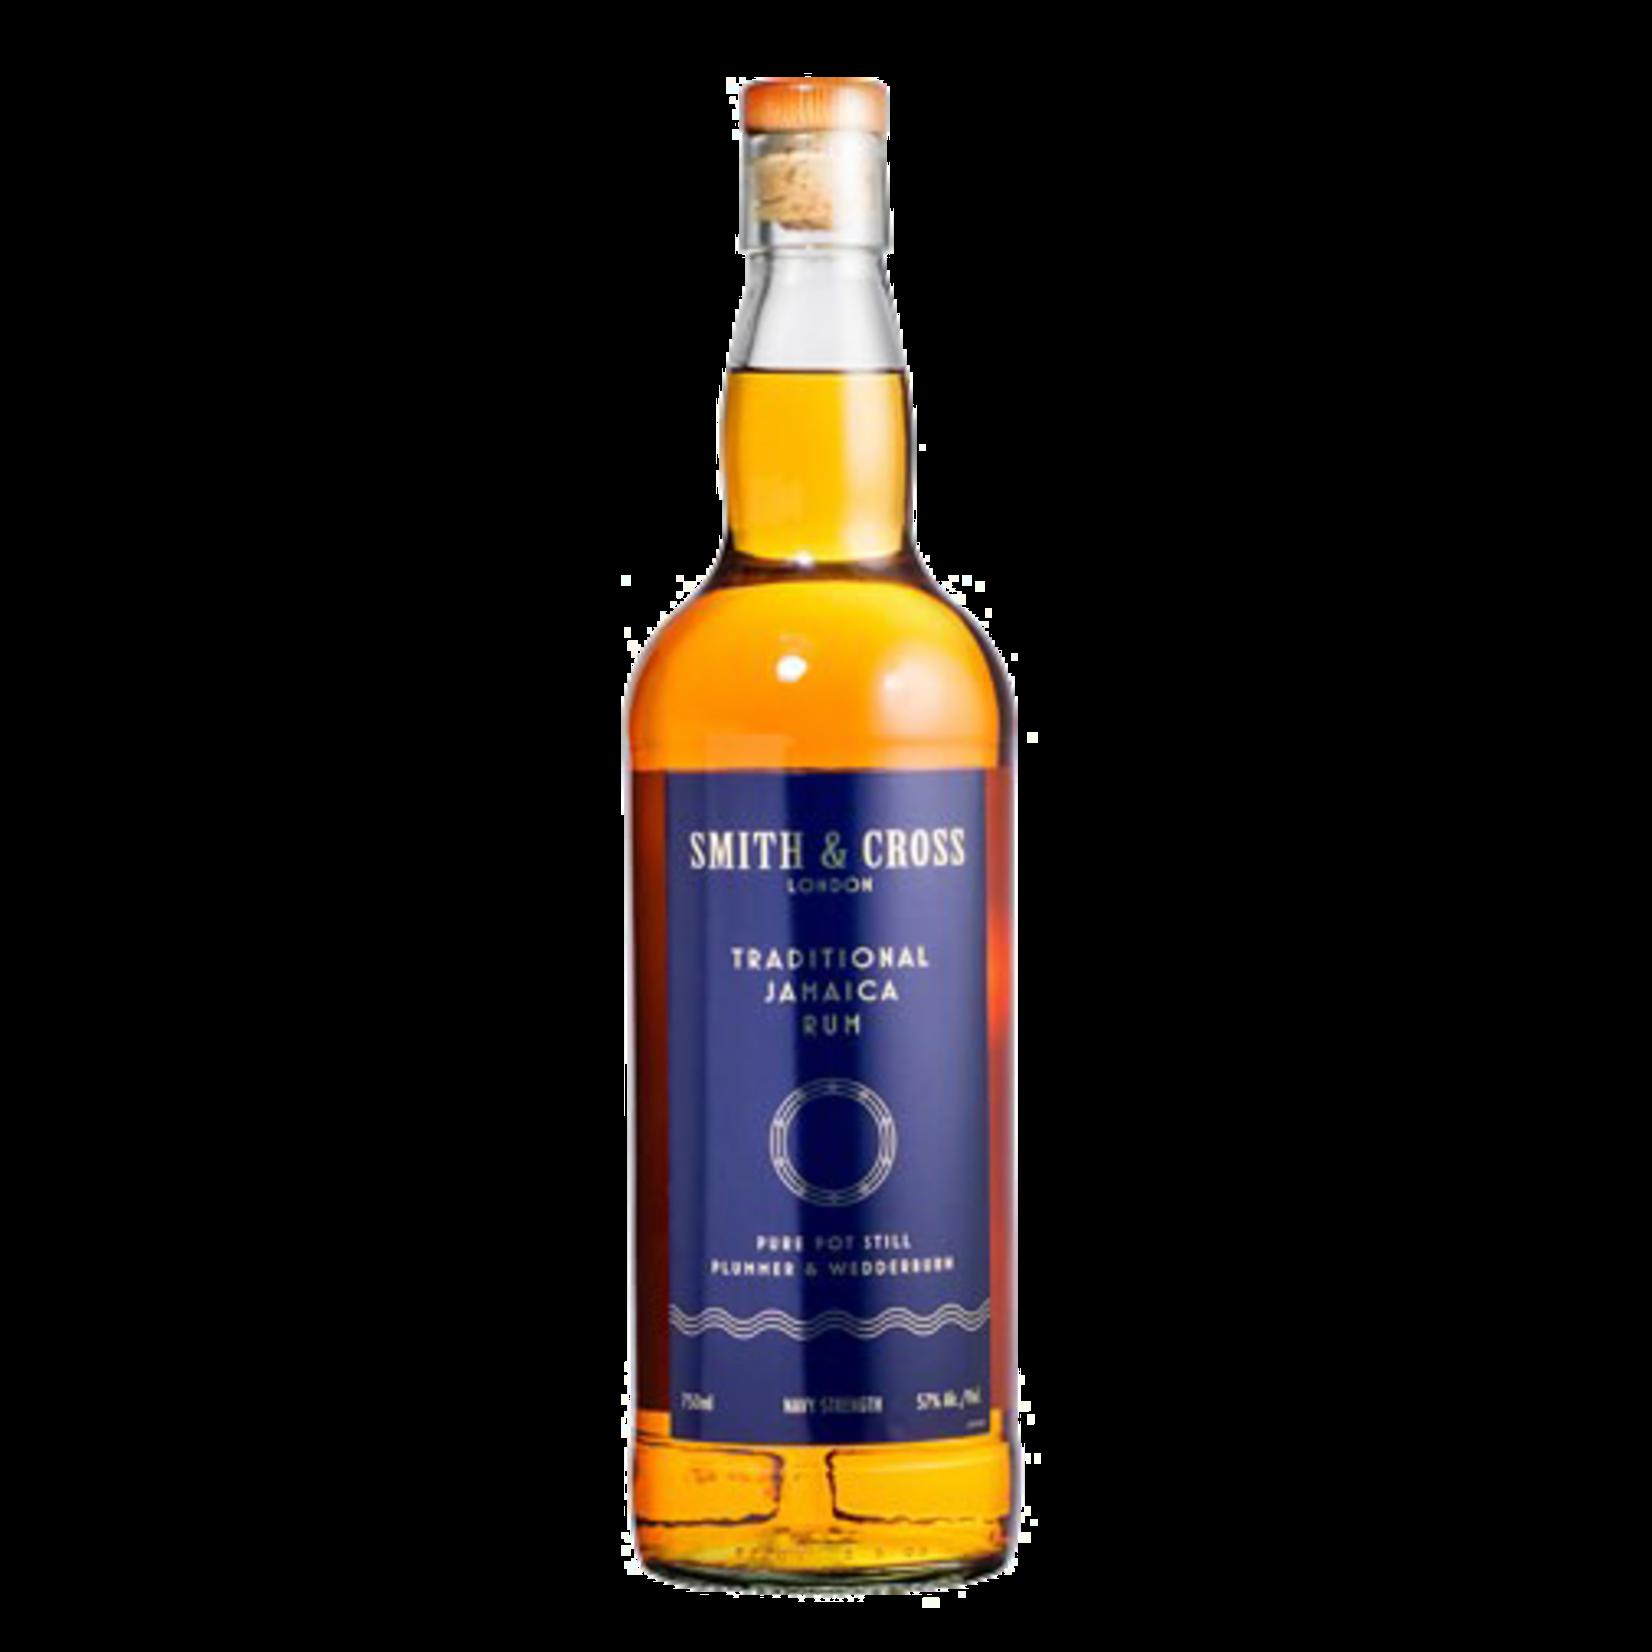 Spirits Smith & Cross Traditional Jamaica 'Navy' Rum